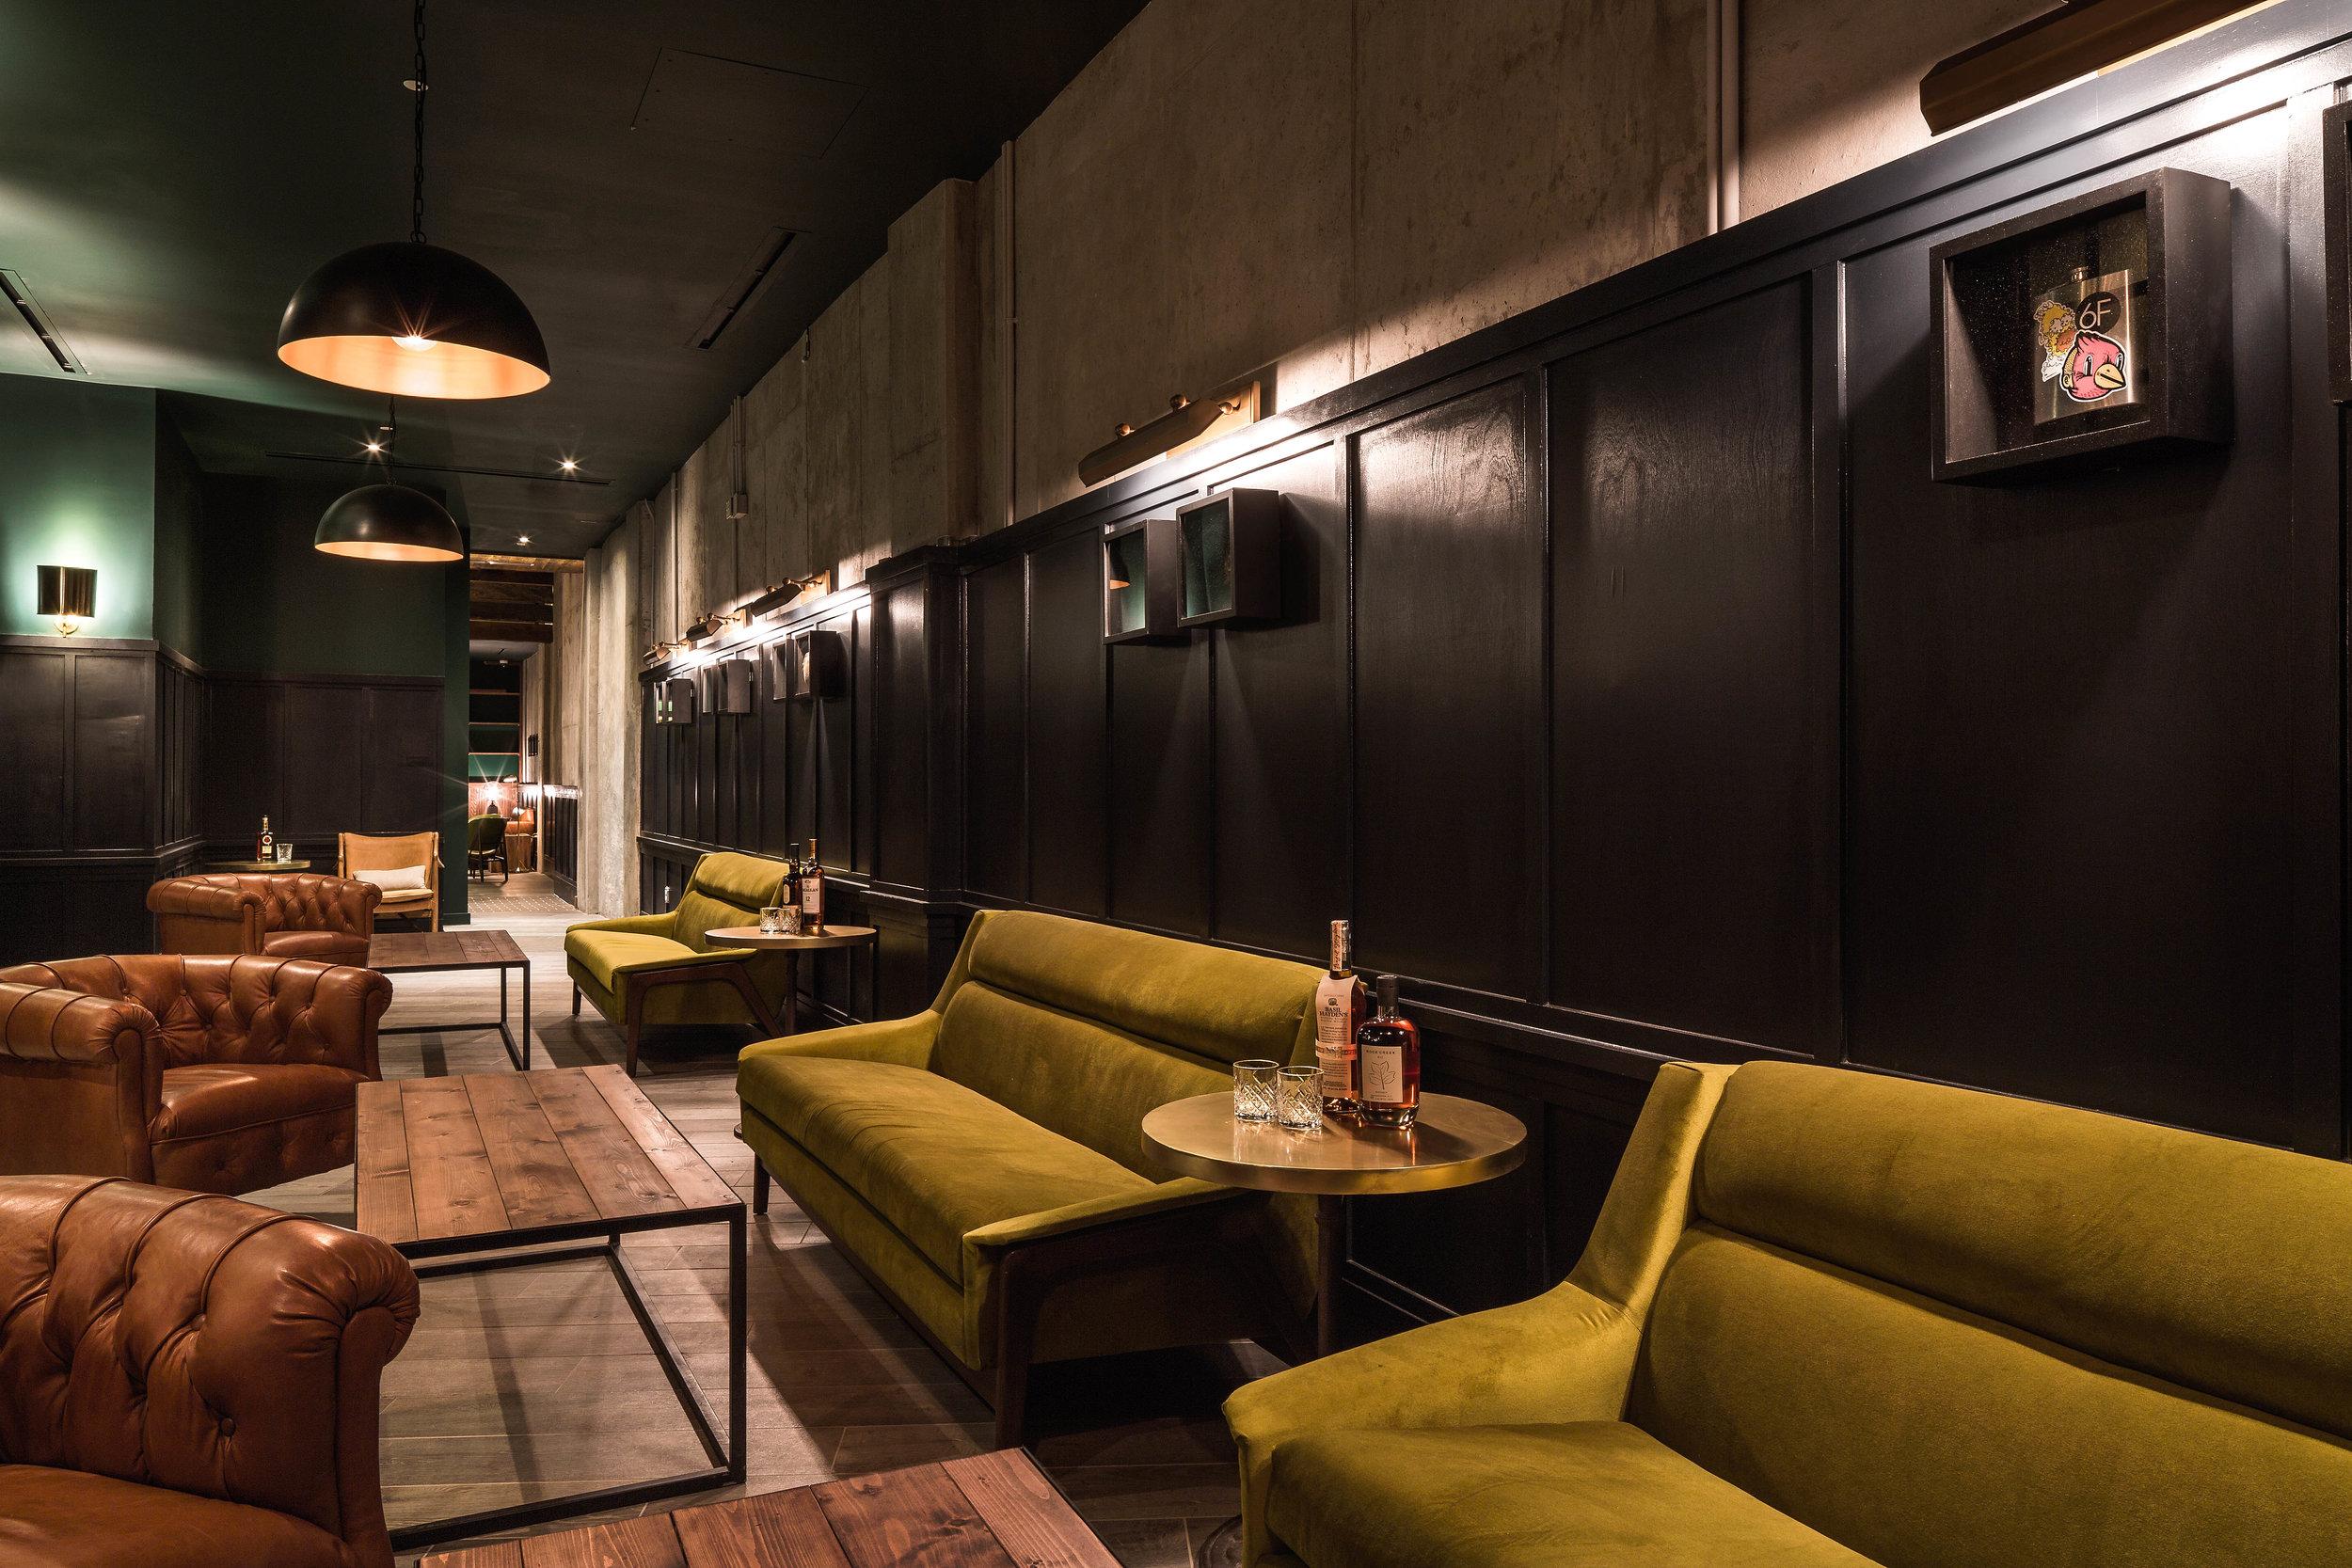 studio-saint-hotels-pod-hotel-crimson-whiskey-washington-dc-8